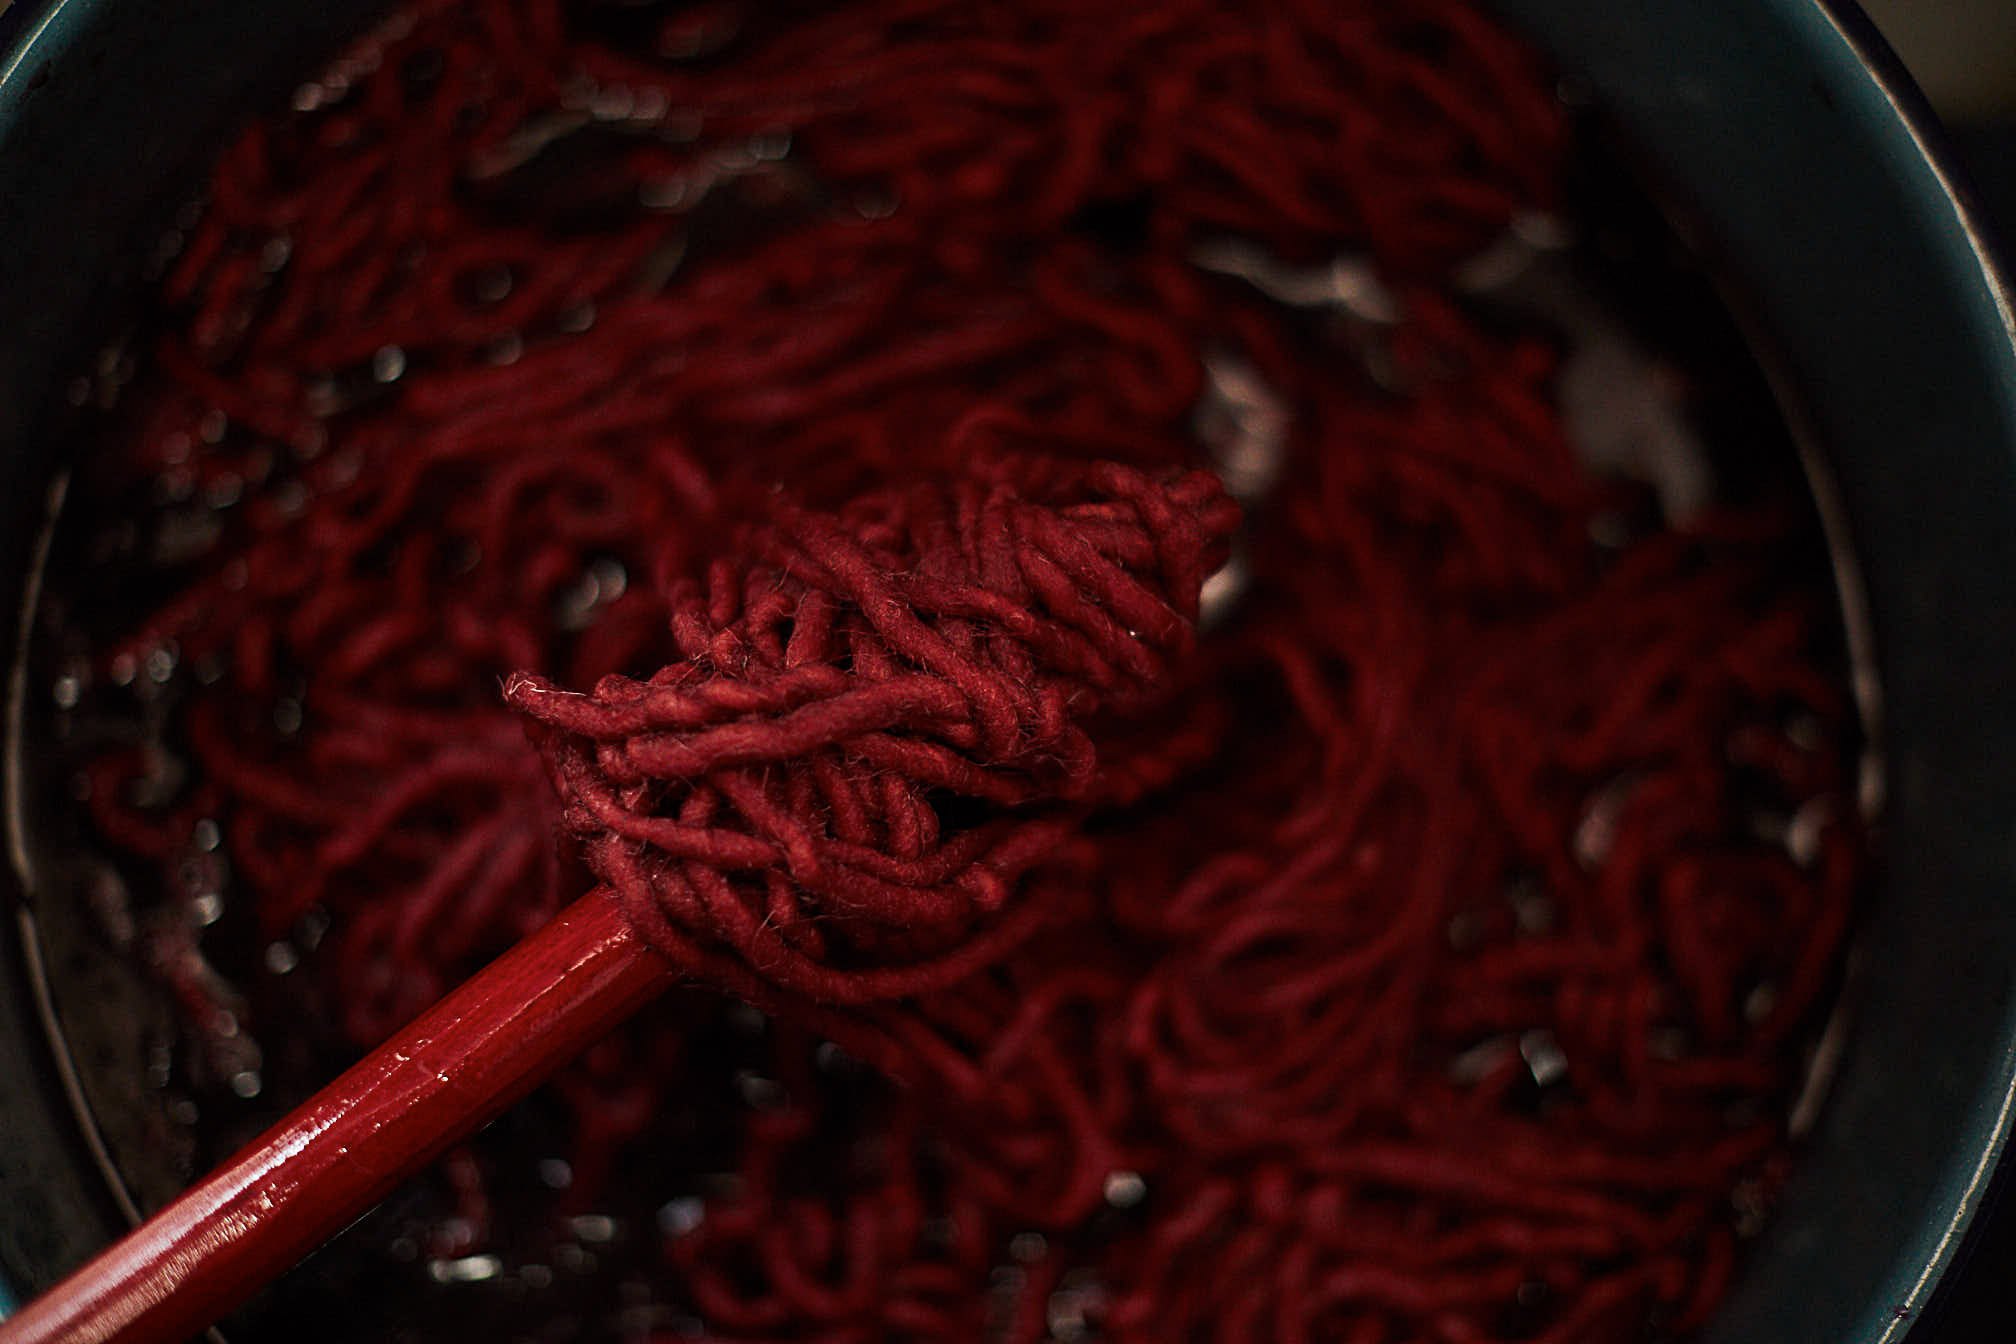 Madda Studio natural dye process using cochineal to hand-dye wool